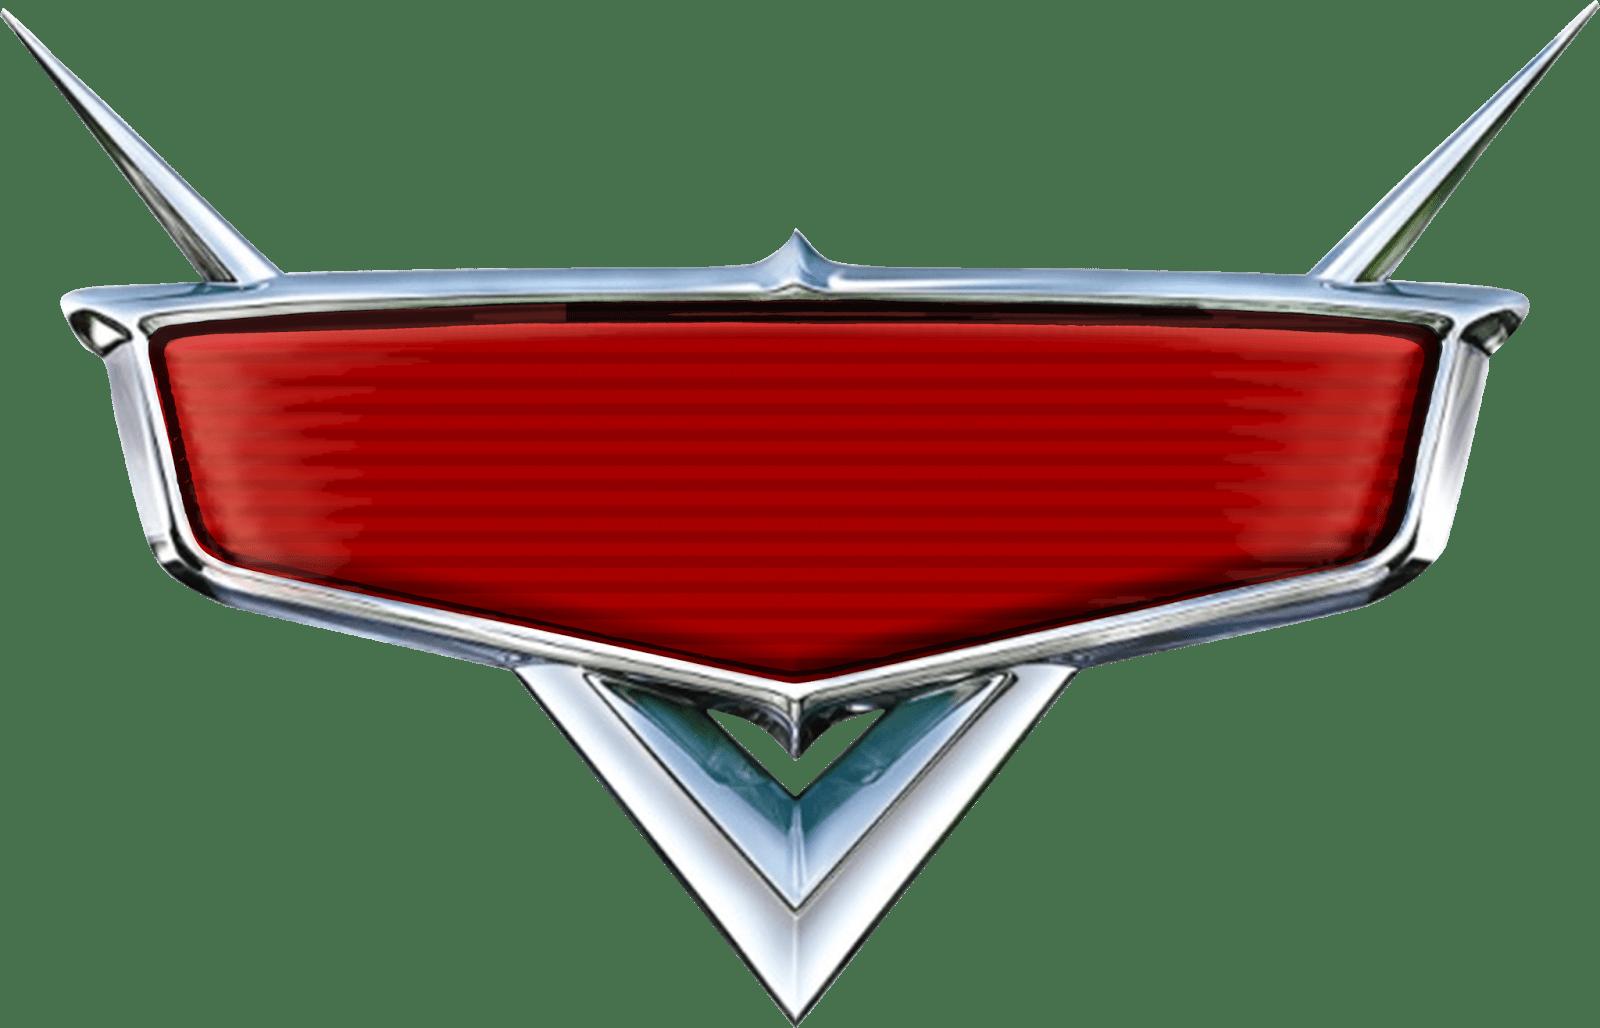 LogoCarsparaeditarconnombrepersonalizarlogocars